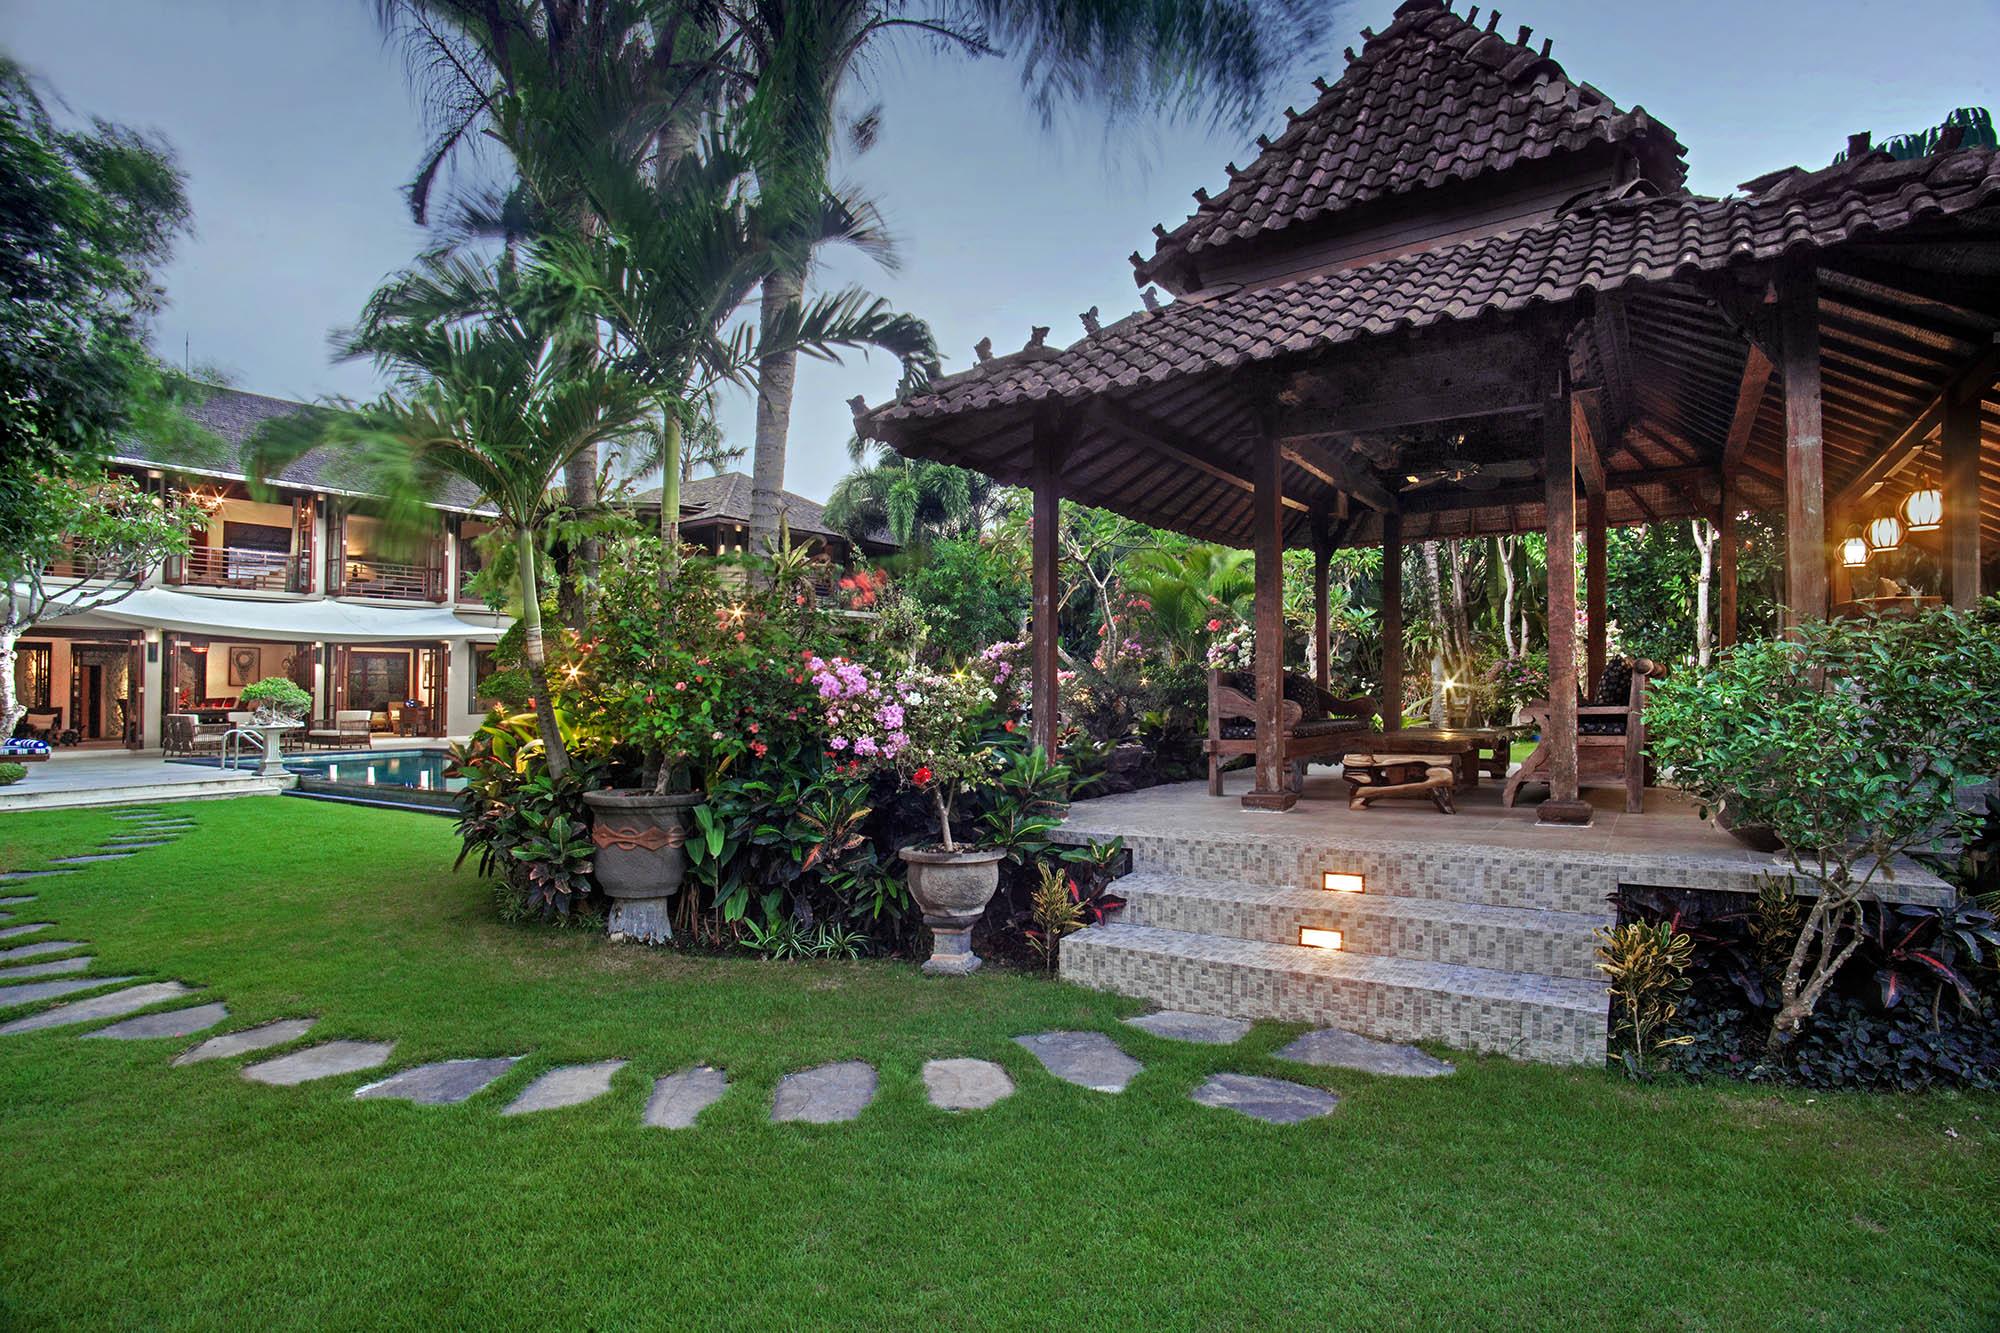 villa-avalon-main-house-garden-joglo.jpg